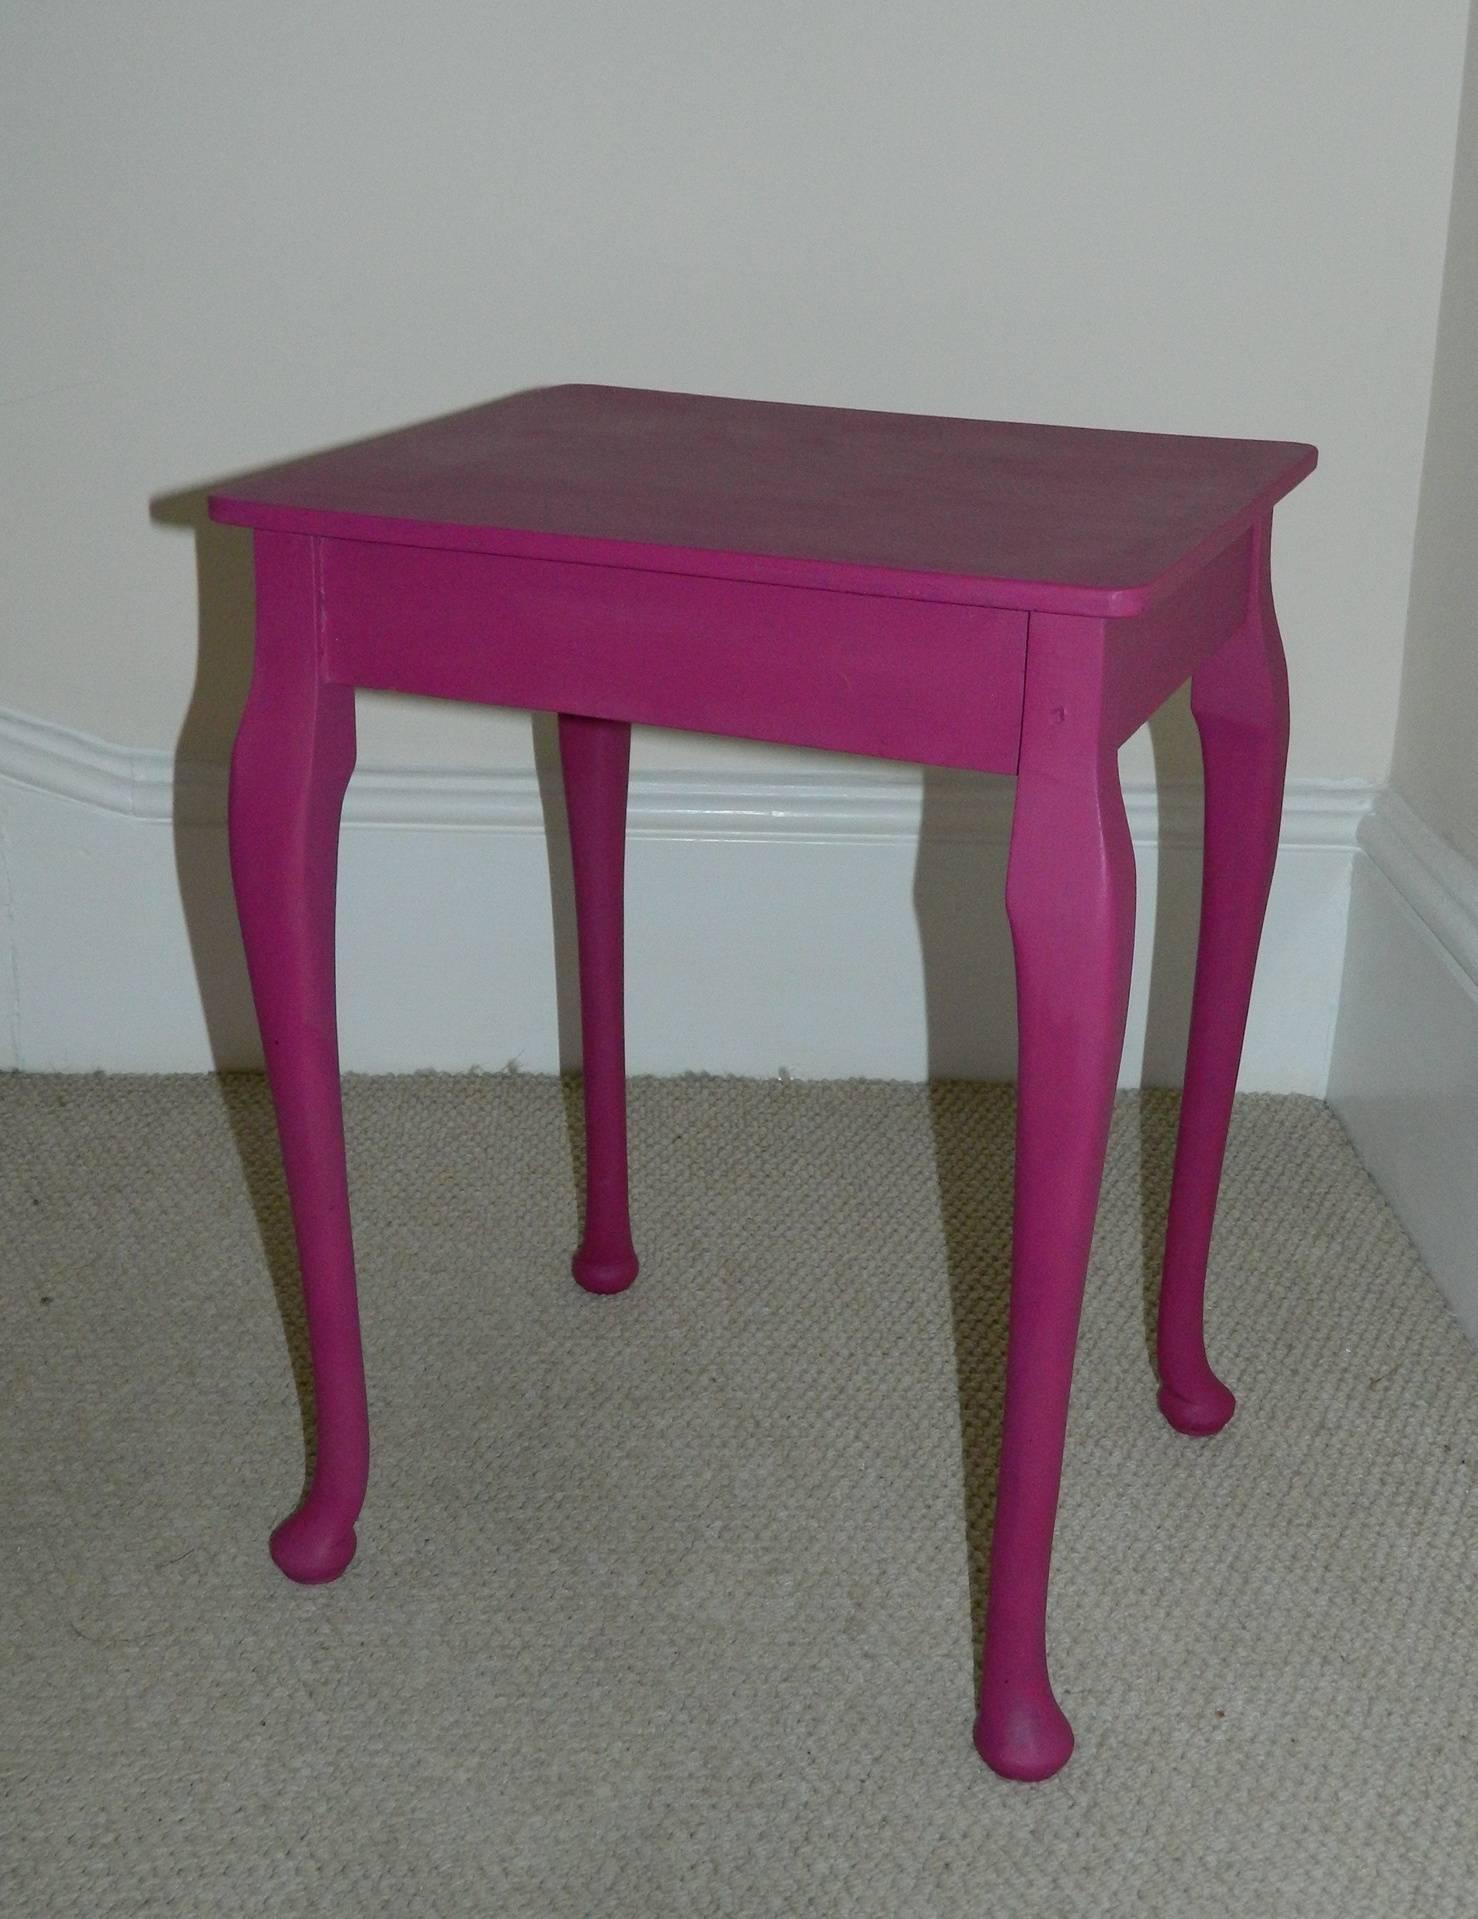 Simple little table